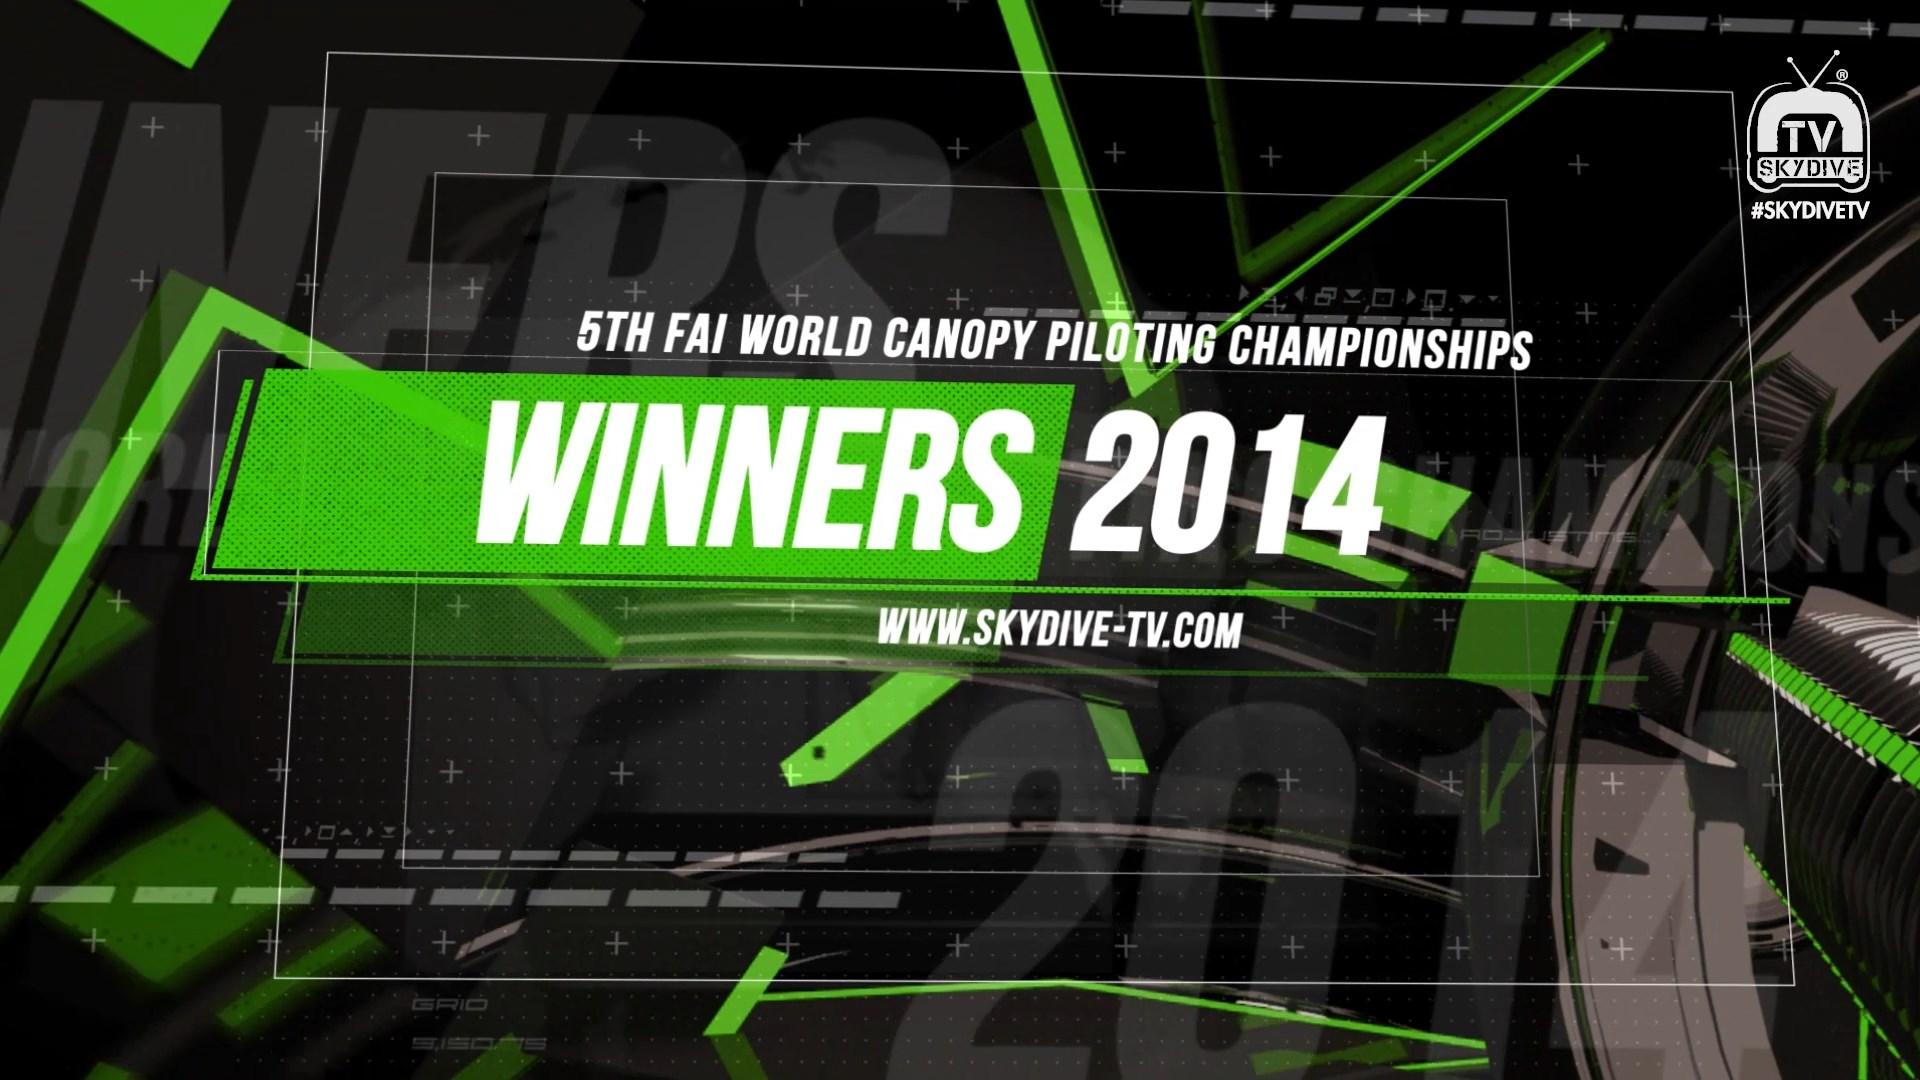 The Champions-5th FAI World Canopy Piloting Championships 2014